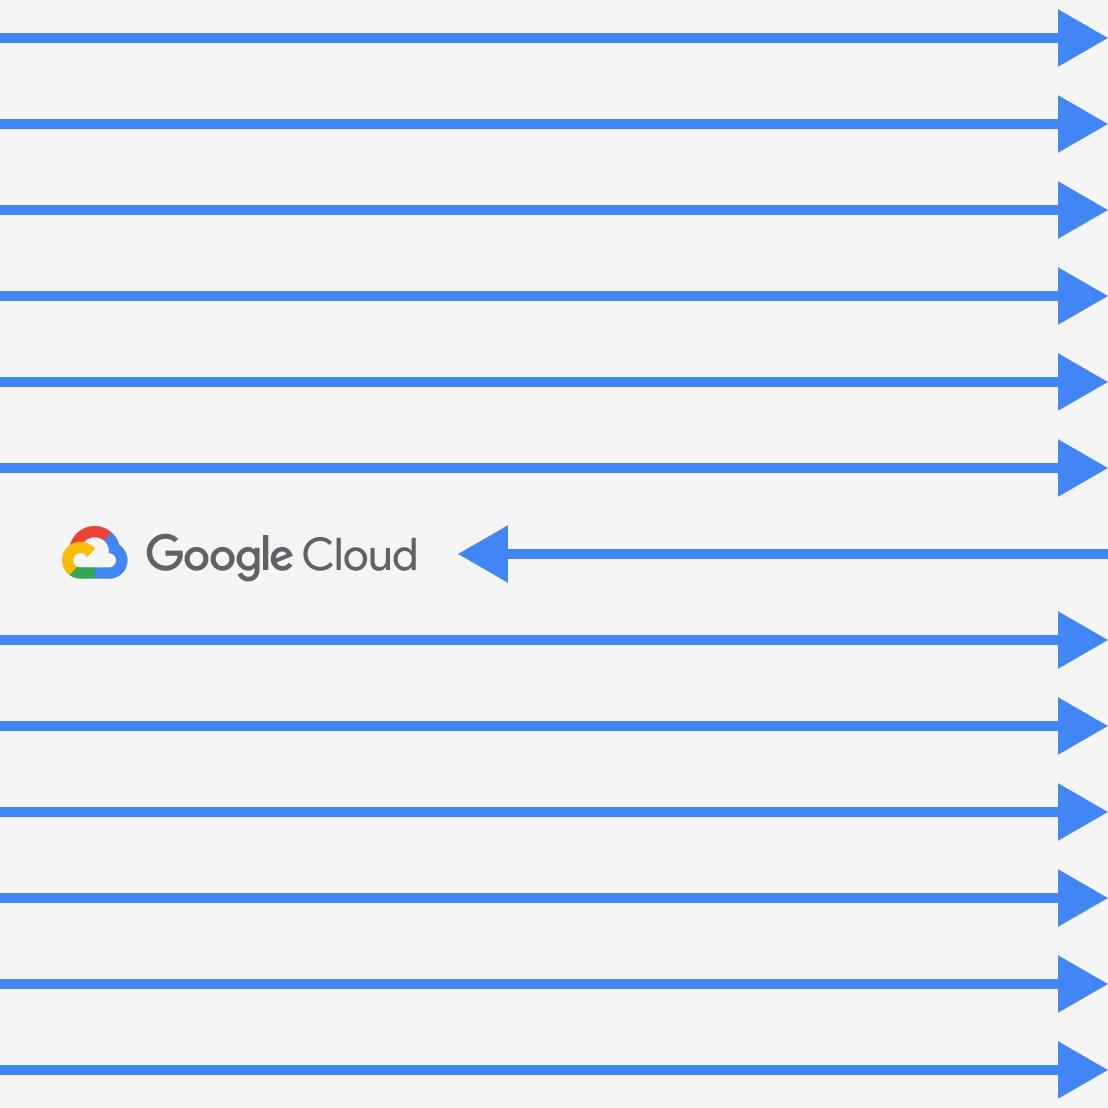 hight resolution of google cloud diagram software